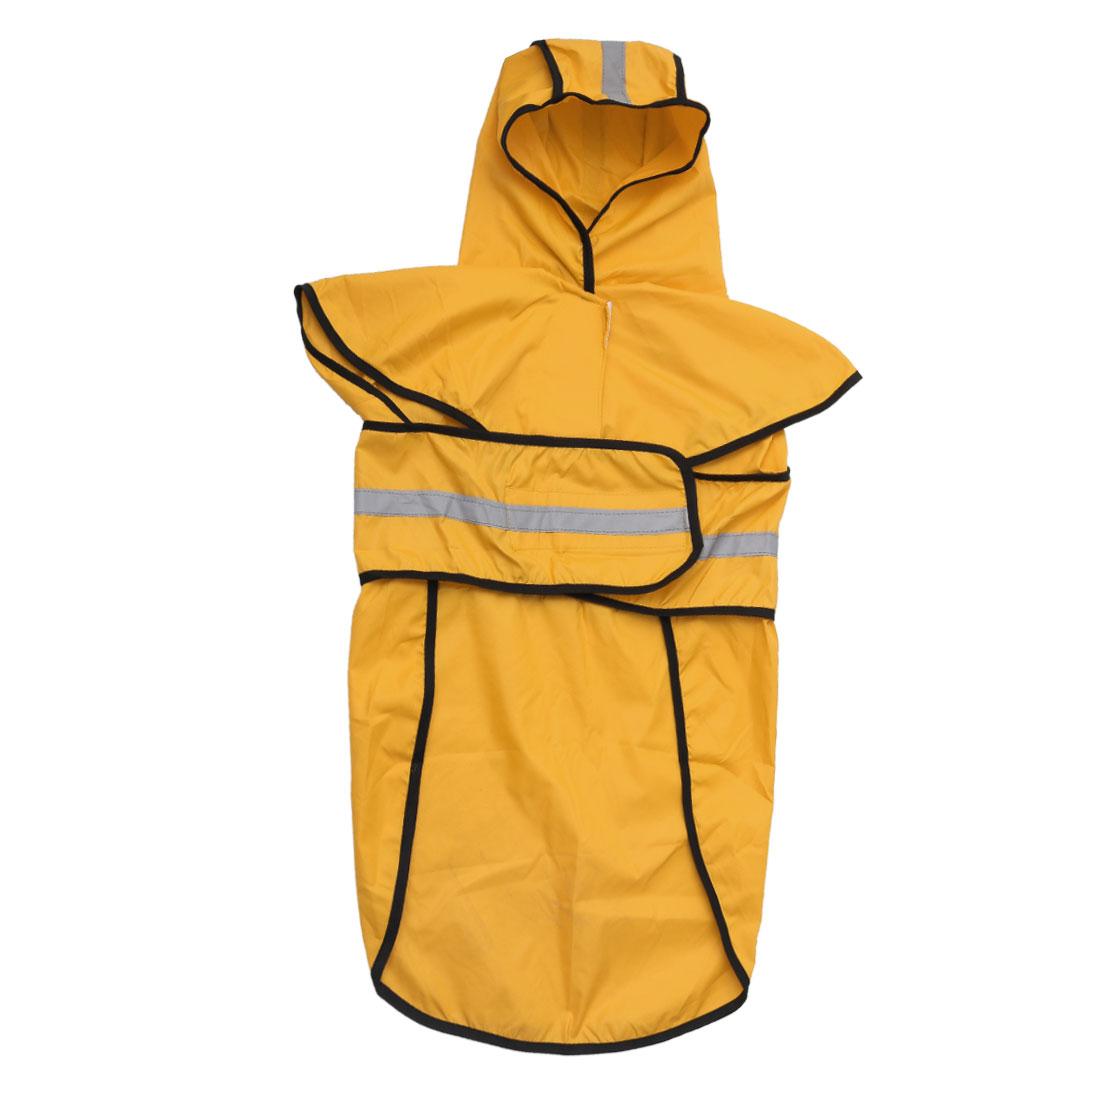 Pet Dogs Raincoat Rain Jacket Poncho Cloth Water-resistant Rainwears Yellow 2XL